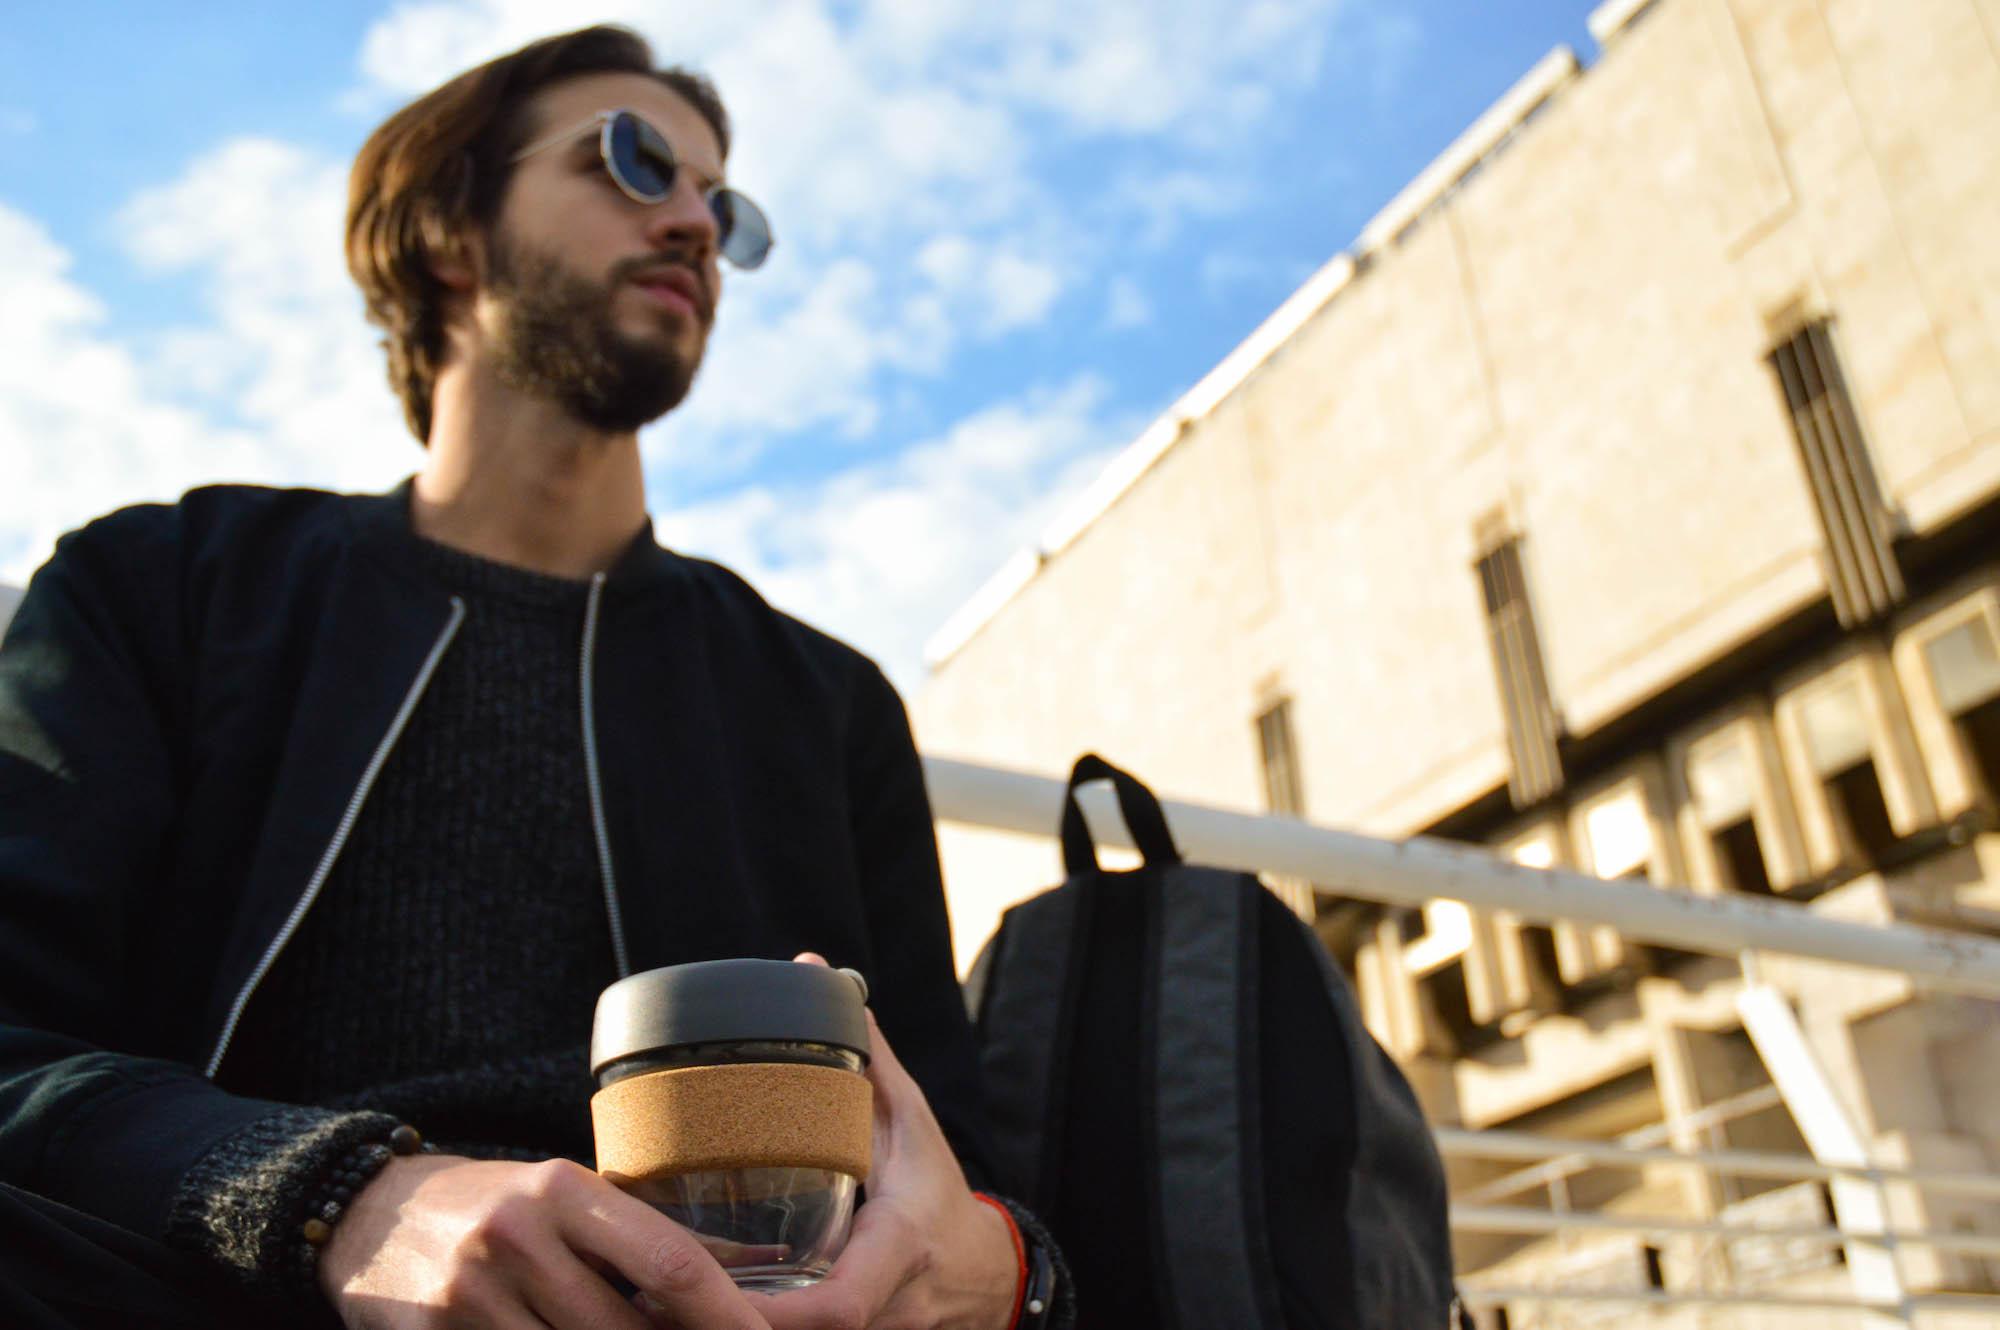 Na storoži ekologiї — istorija kavovogo brendu Coffeelaktika